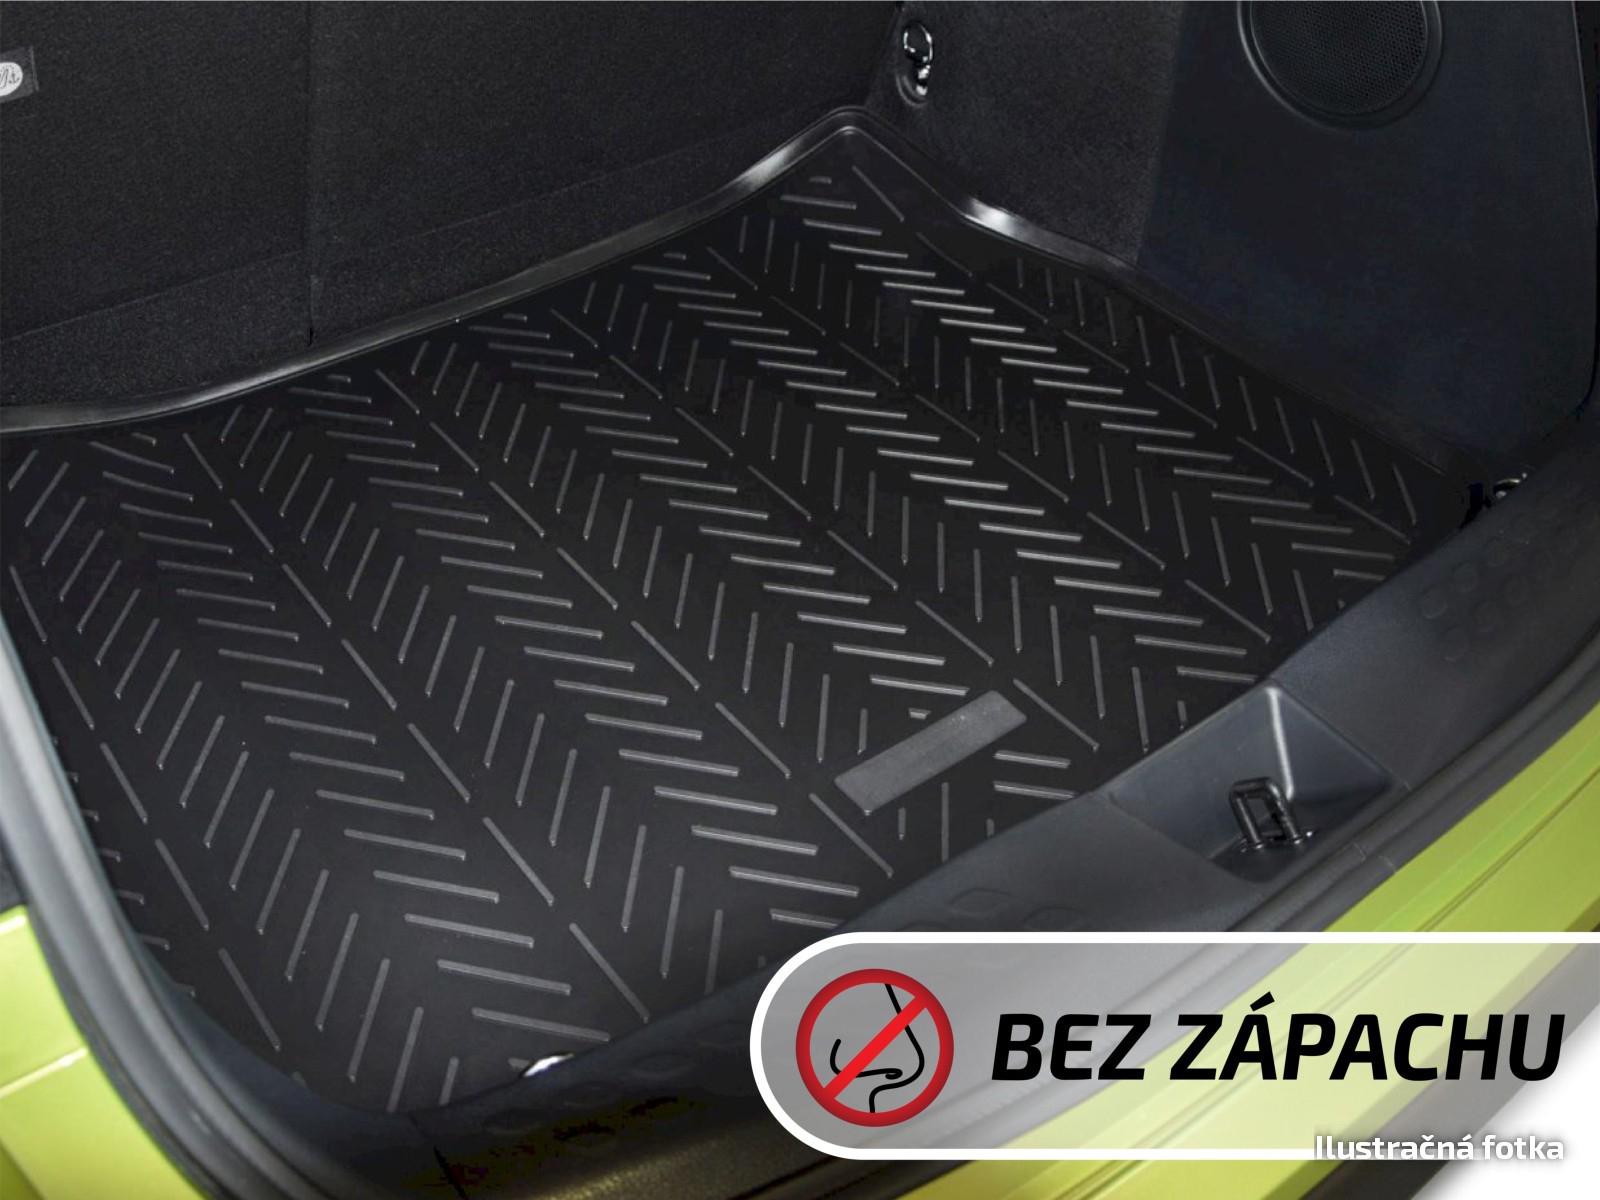 Poza cu Tavita de portbagaj Premium, Volkswagen Caddy, 2015-